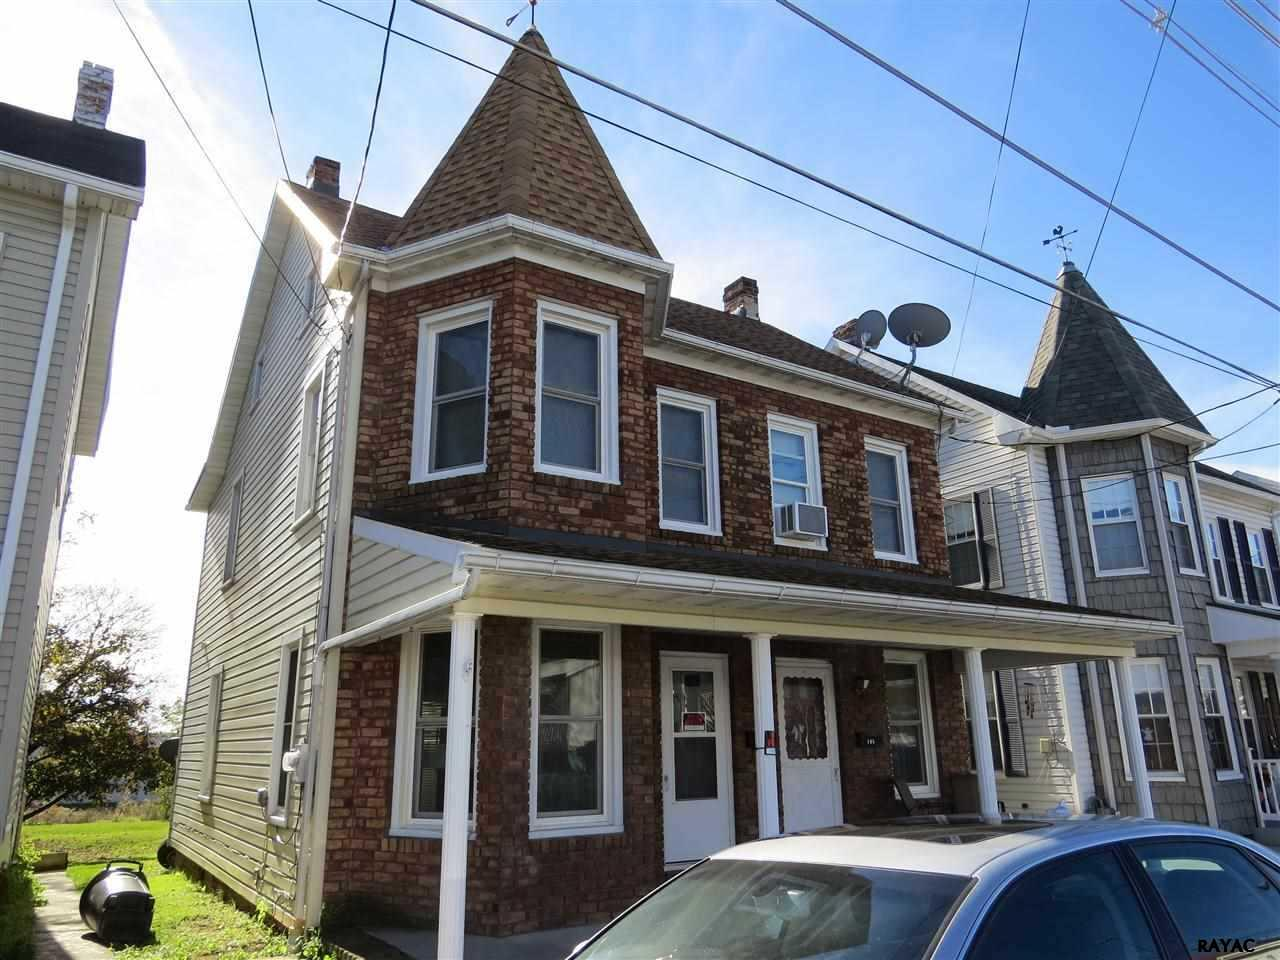 145 Lumber St, Littlestown, PA 17340